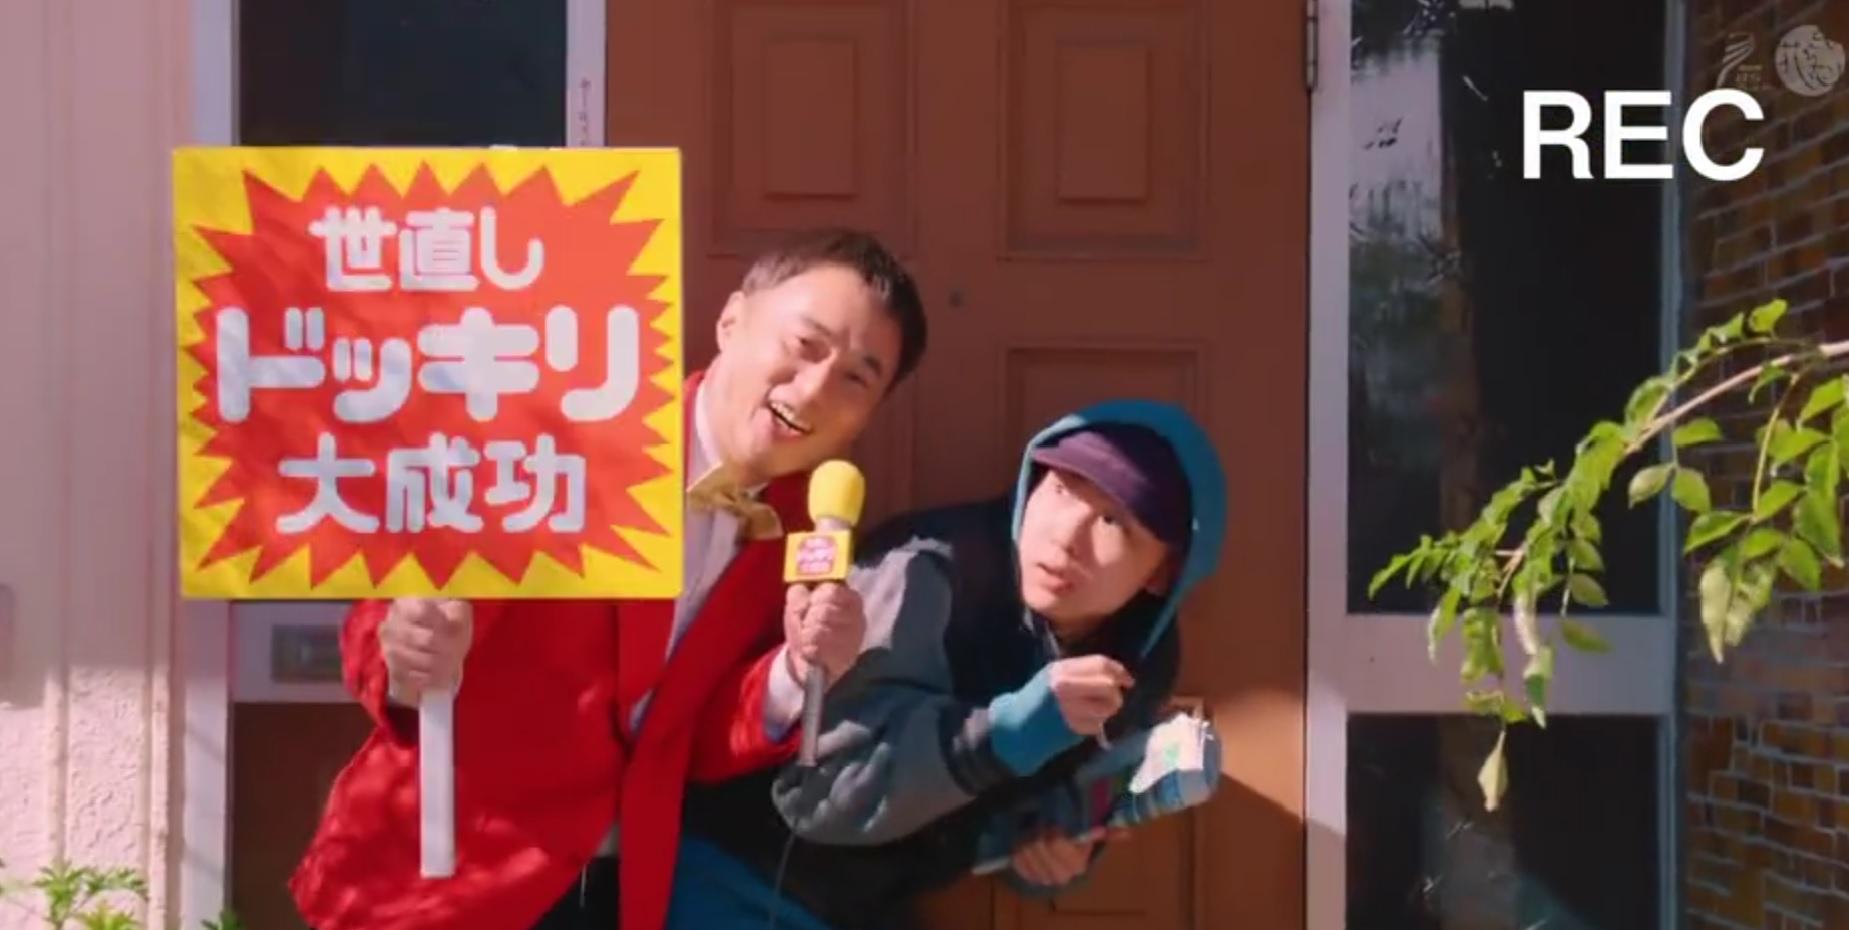 NHK 劇集「沒有一個謊言」中,有電視台整人節目暗中出招引隱蔽青年出門買報紙,但攝製隊現身並揭開詭計時,青年被嚇得近乎休克。似是影射早前朝日電視台節目「北野武的TV擒抱」中破門逼出隱蔽青年事件。